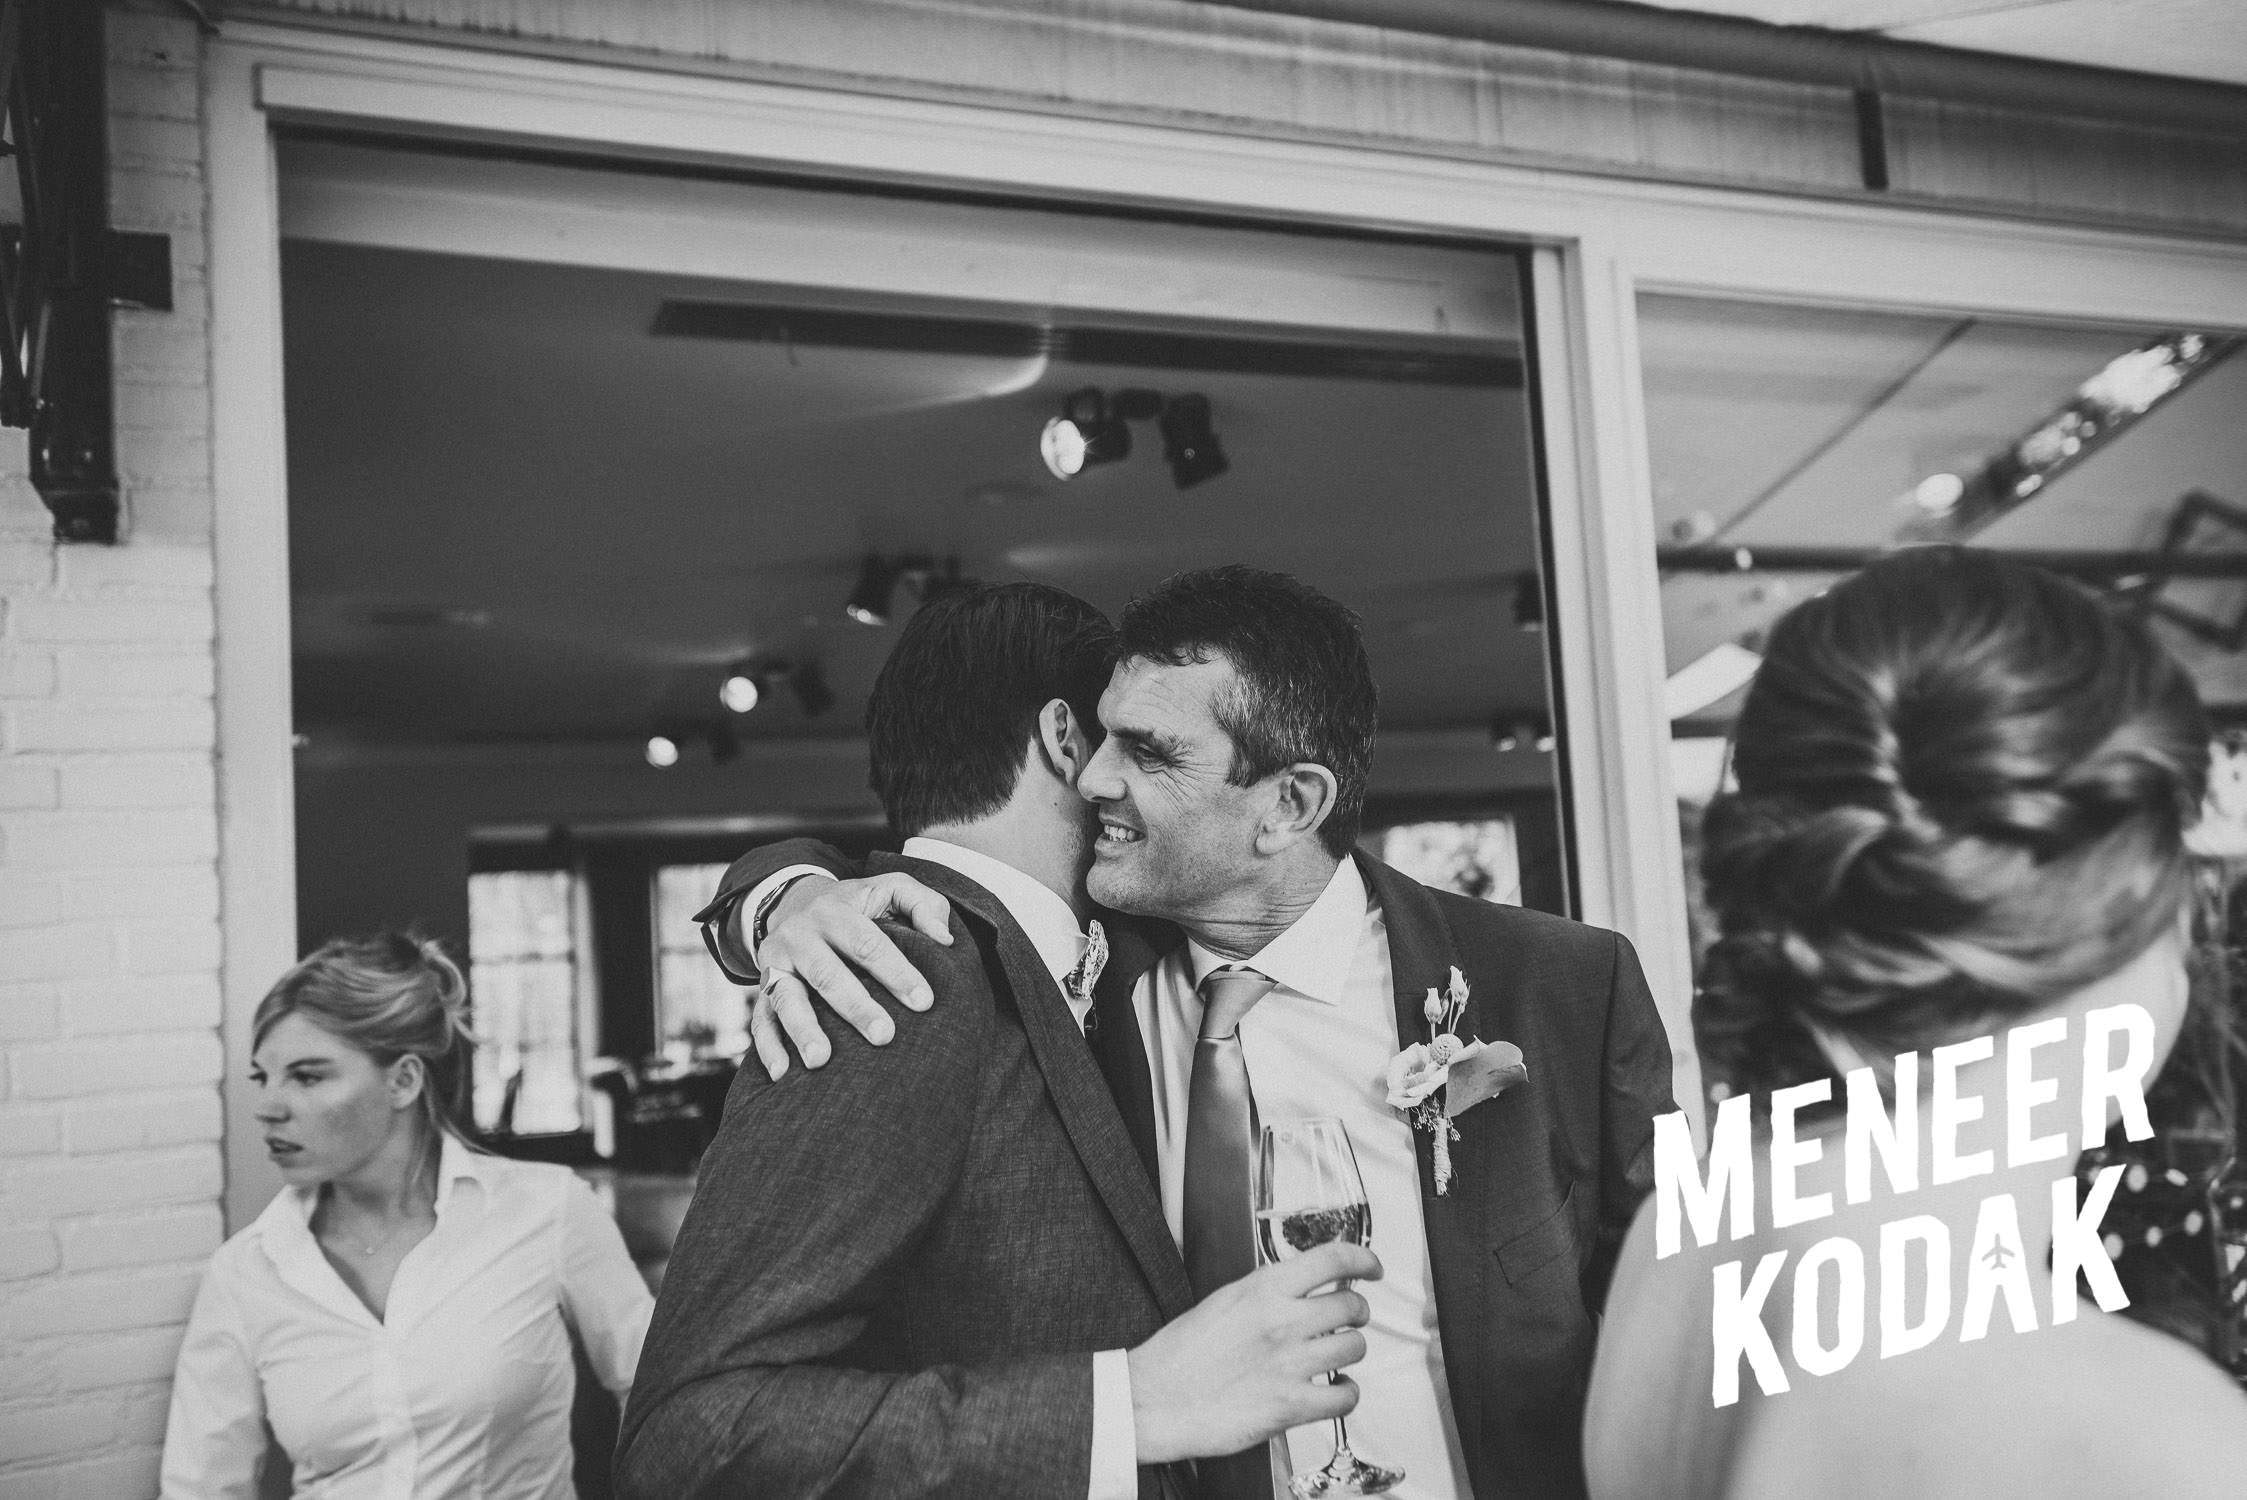 Meneer Kodak - Trouwreportage - Breda - E&M-119.jpg